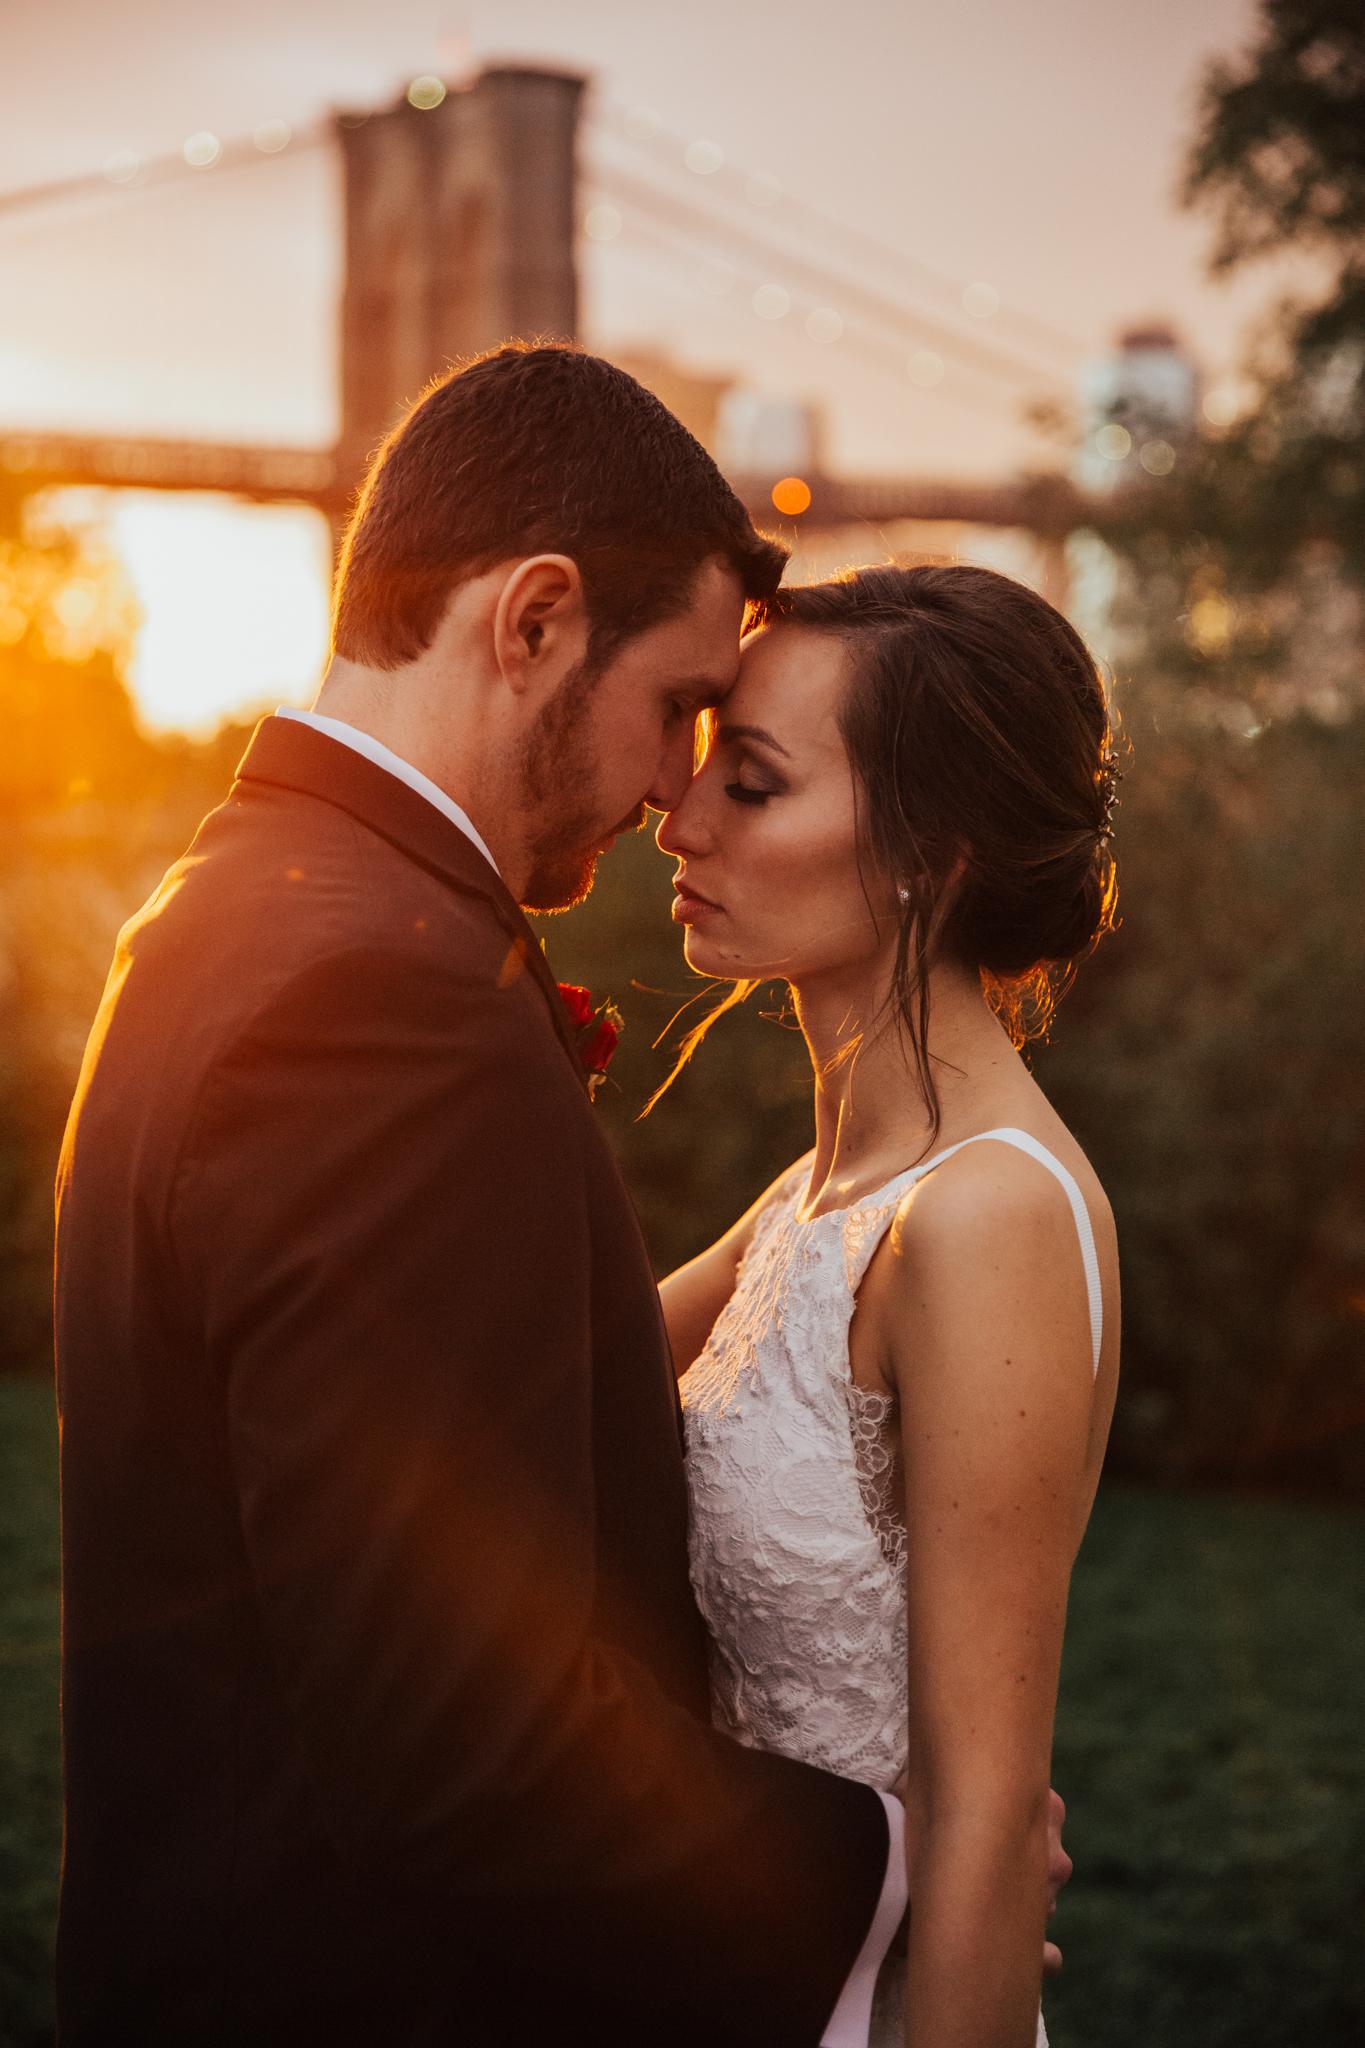 26-bridge-wedding-brooklyn-074.JPG